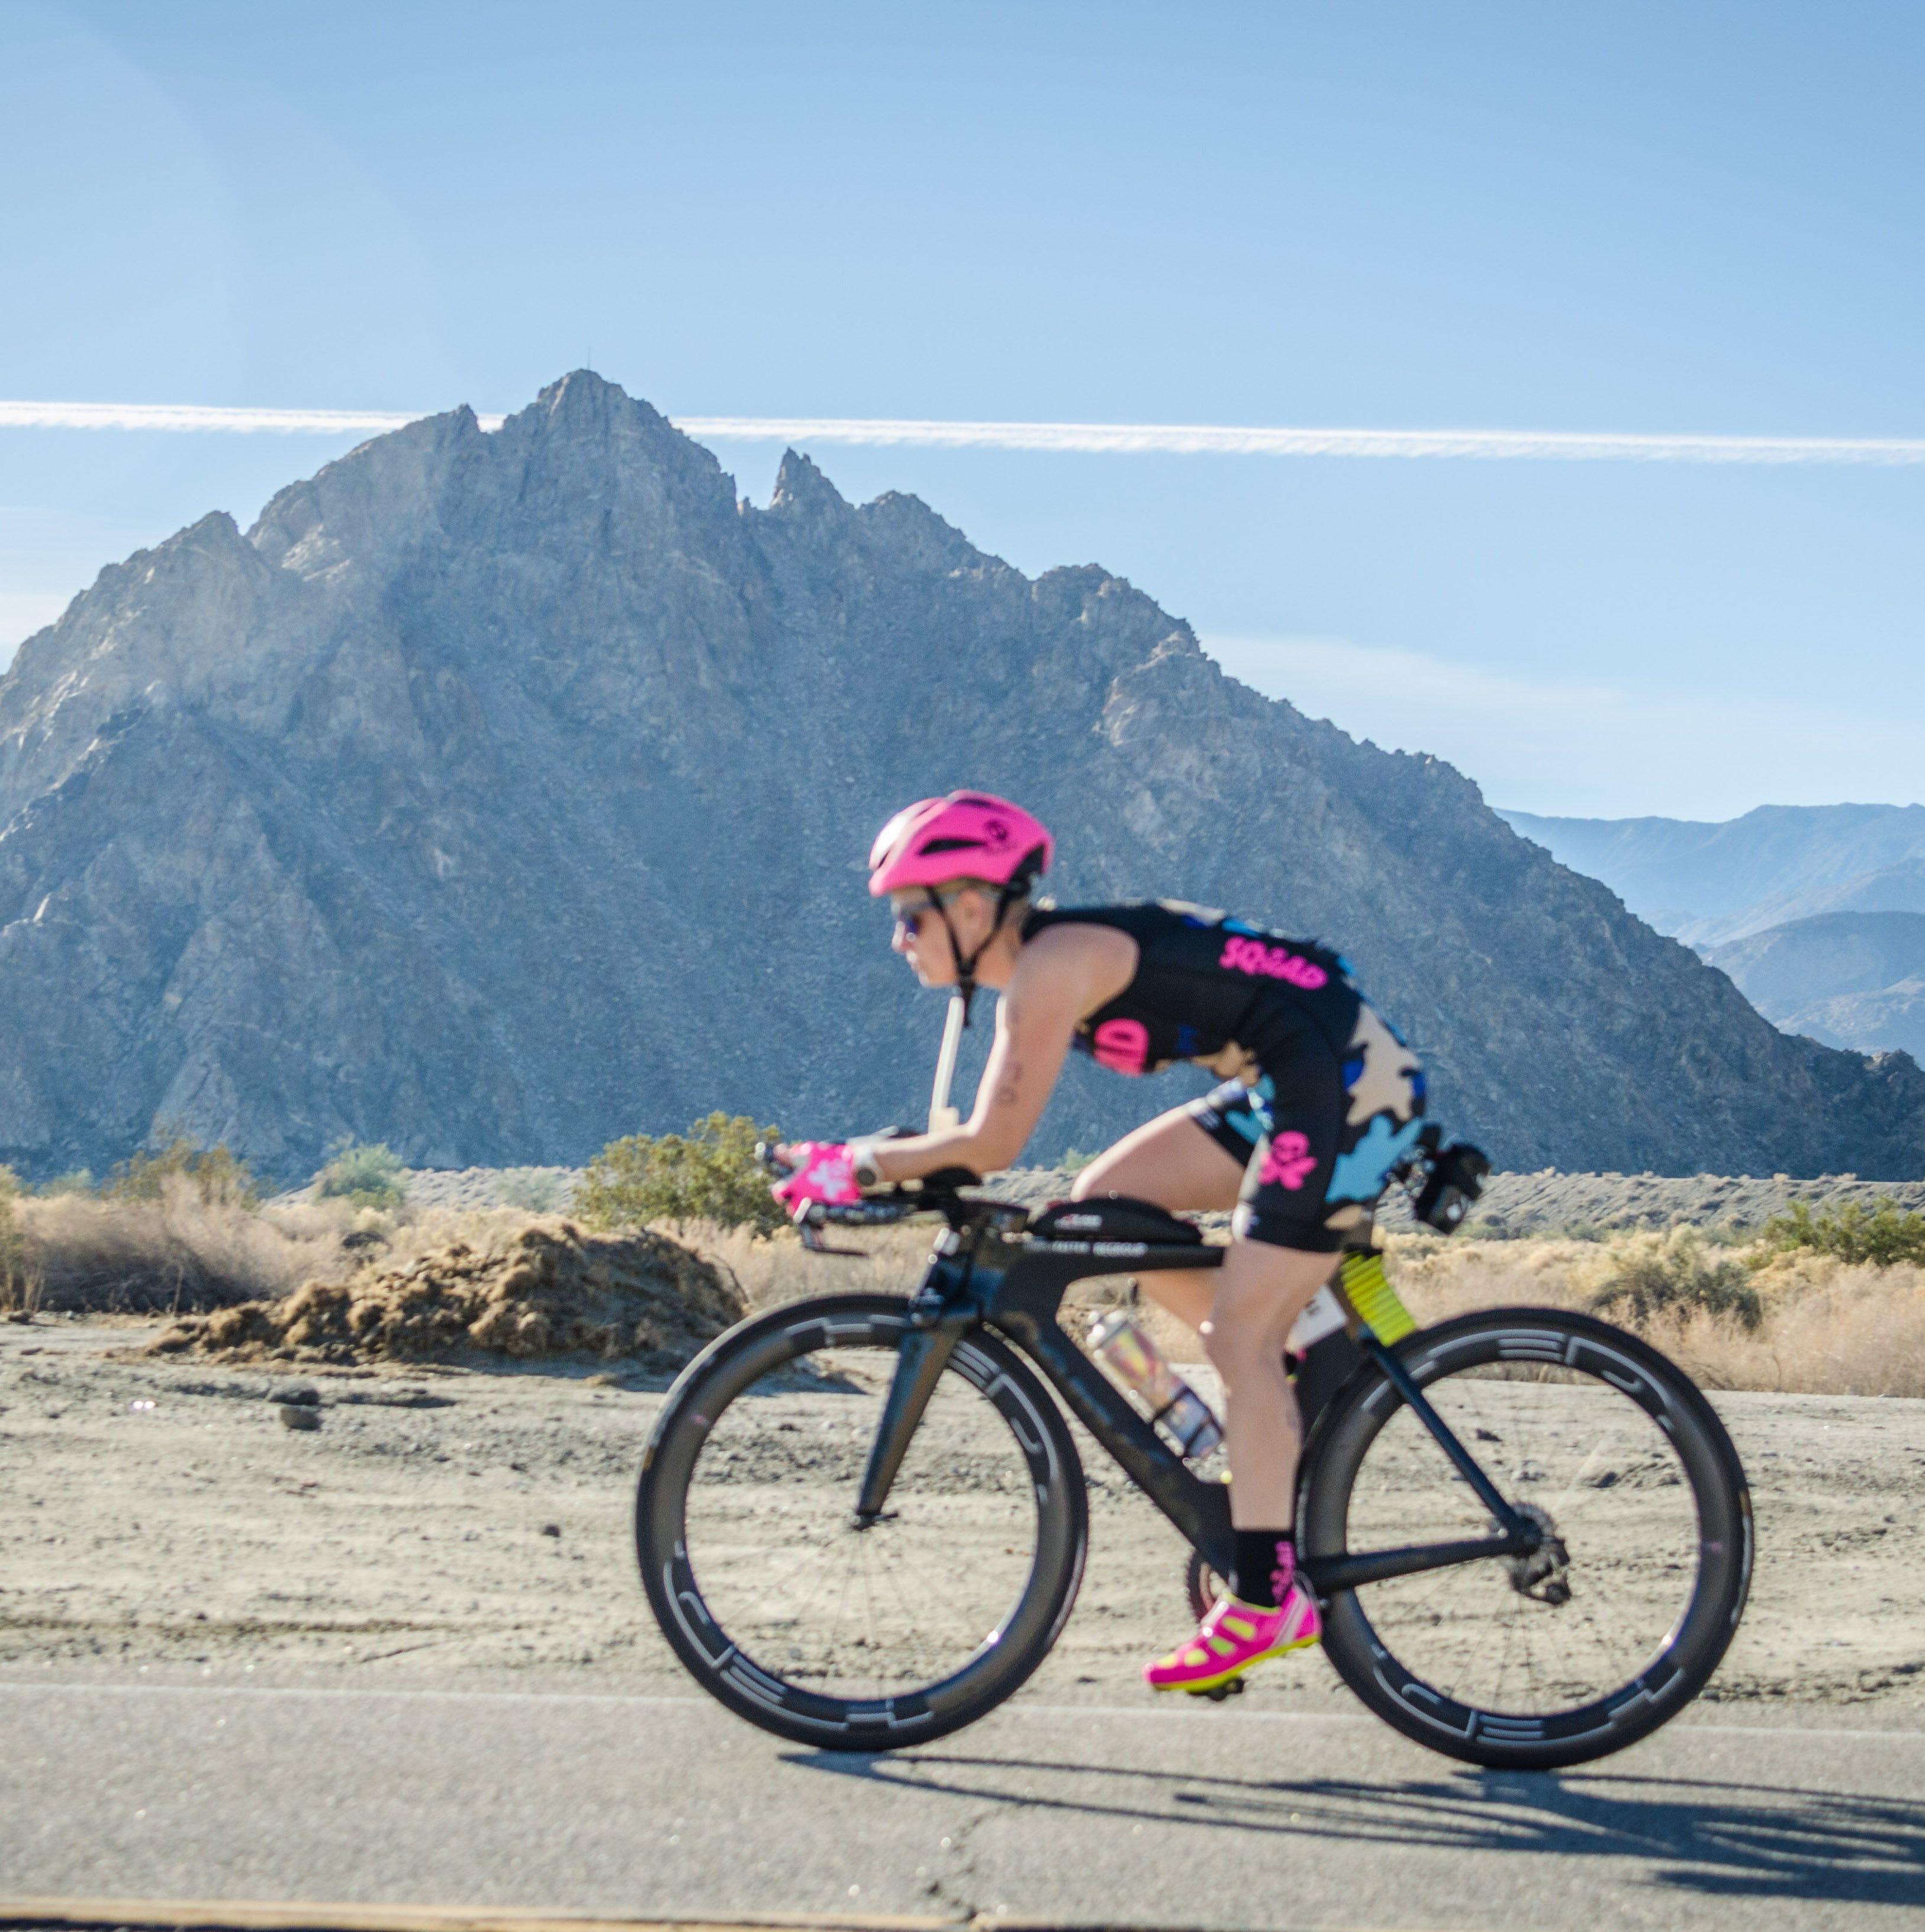 Arizona Senator Kyrsten Sinema breaks 13 hours, sets personal record at Ironman New Zealand